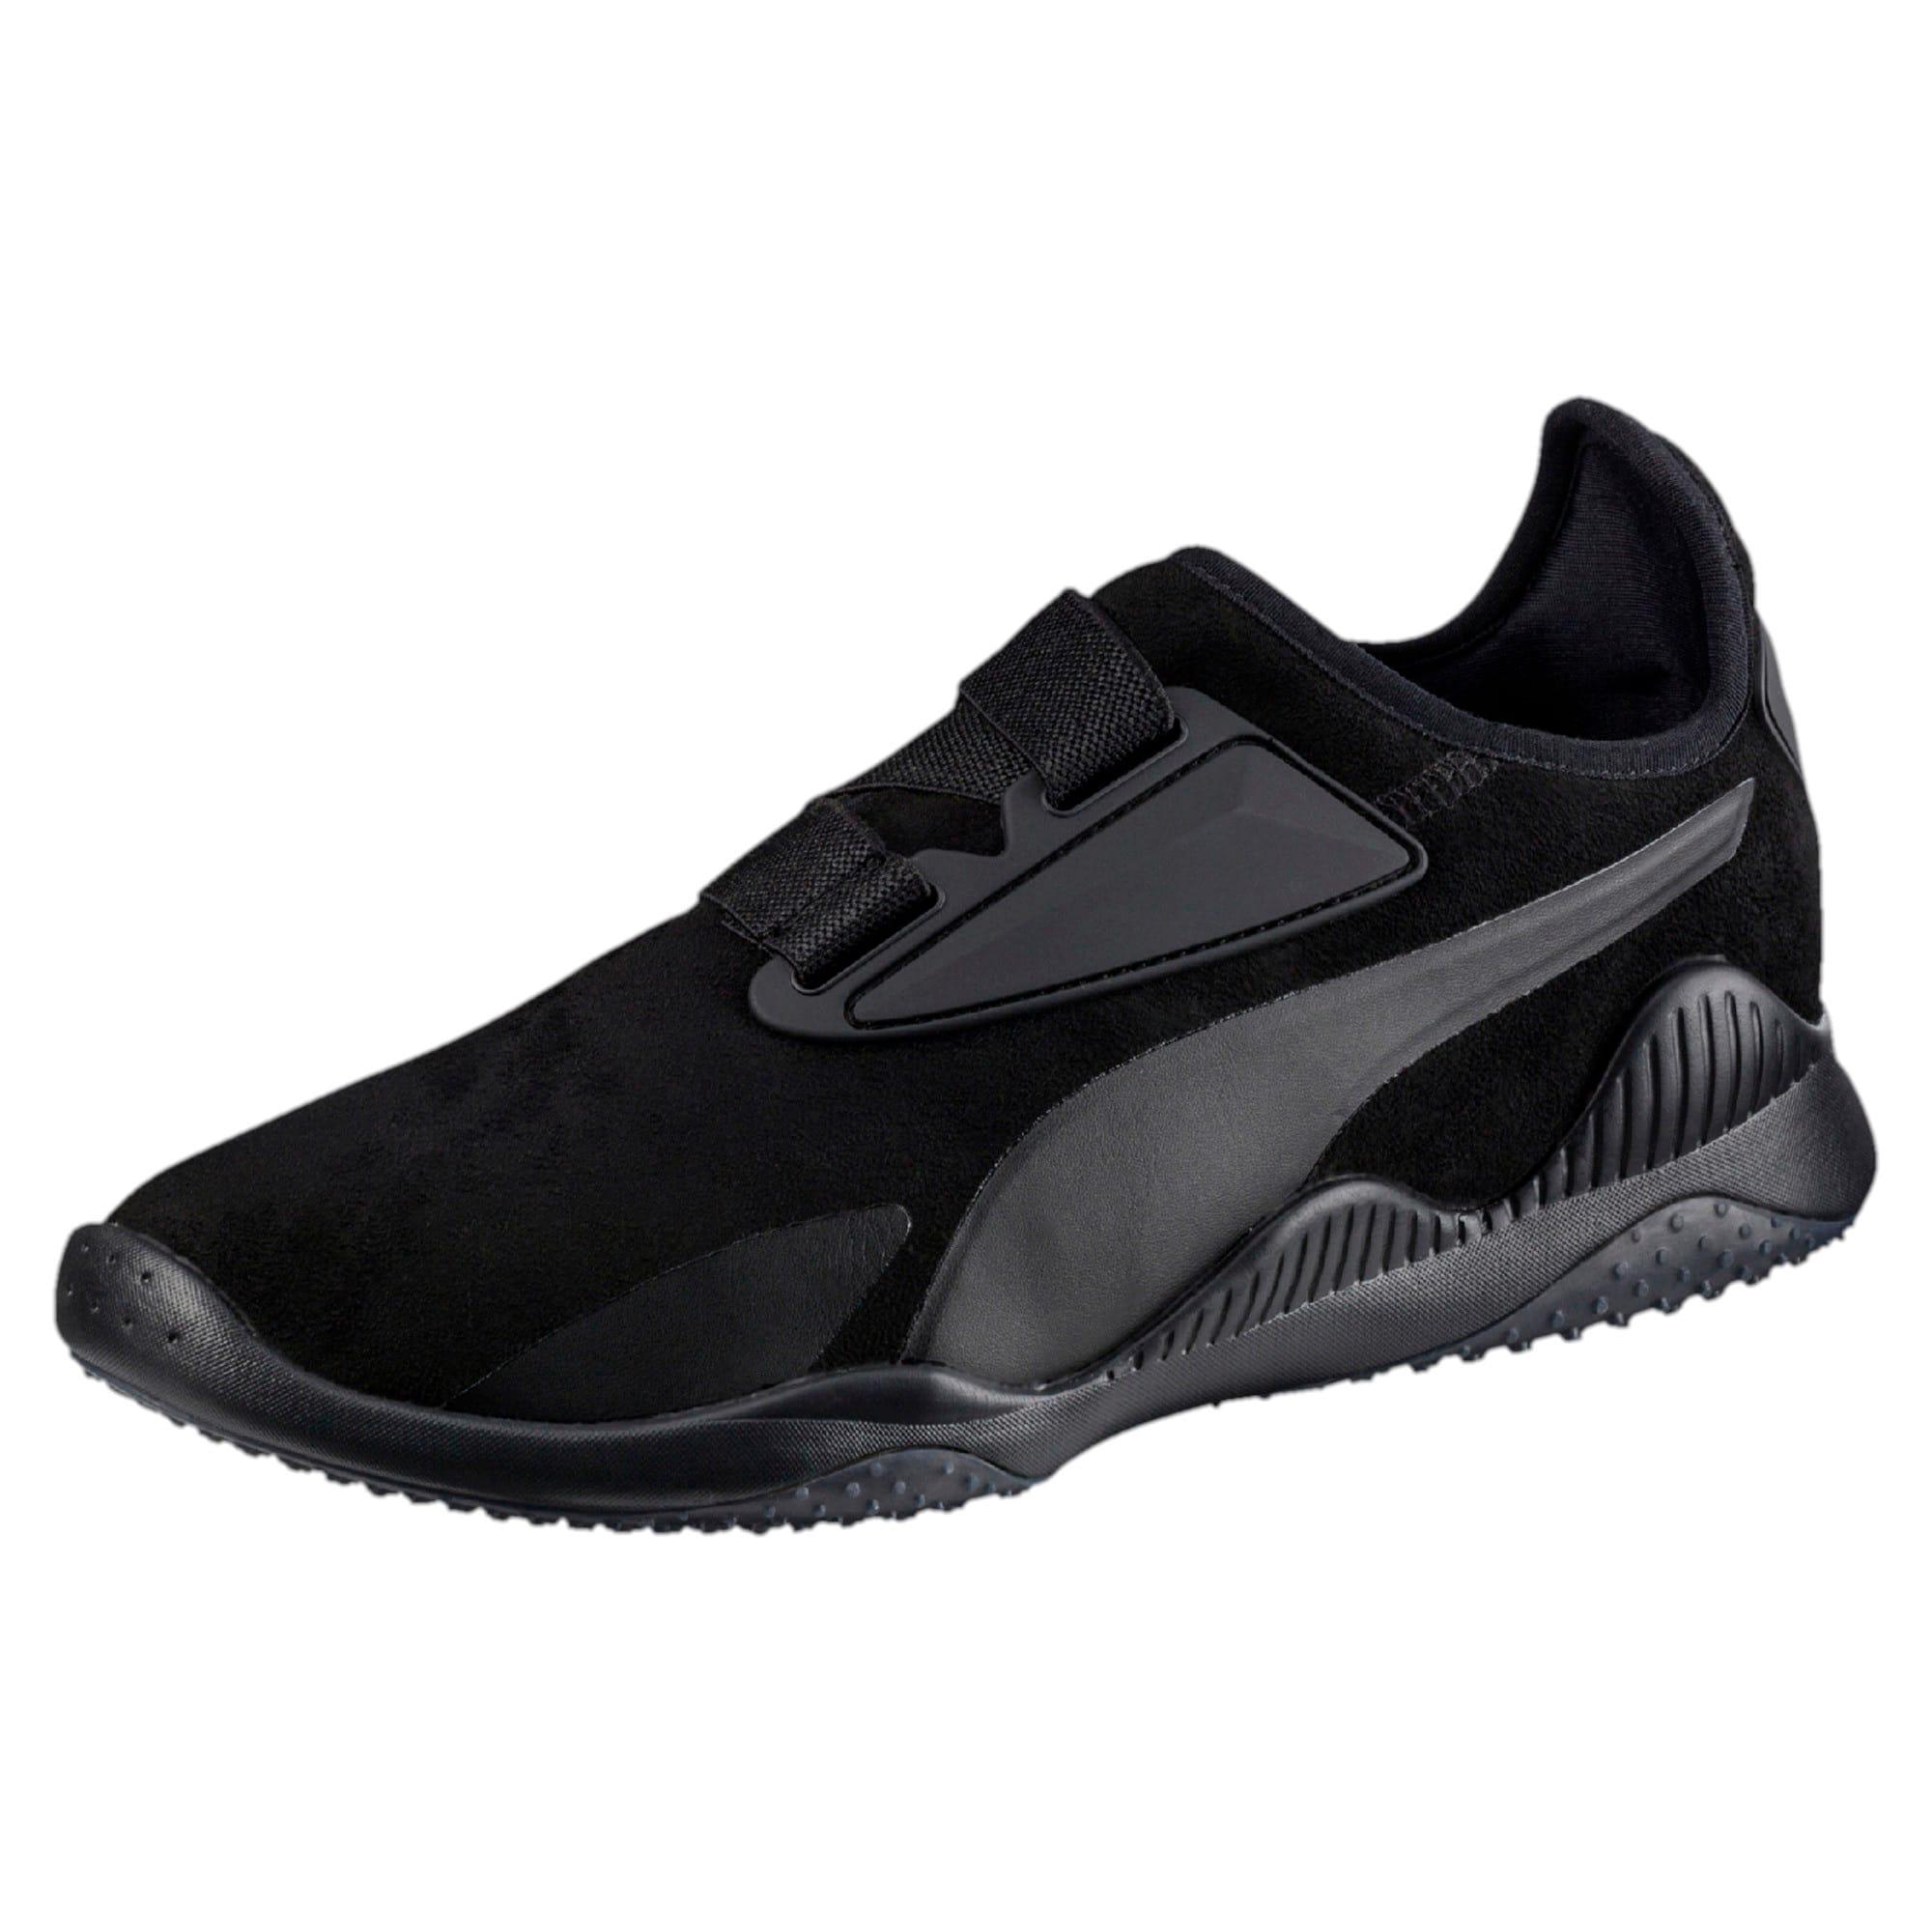 Thumbnail 1 of Mostro Hypernature Trainers, Puma Black-Puma Black, medium-IND